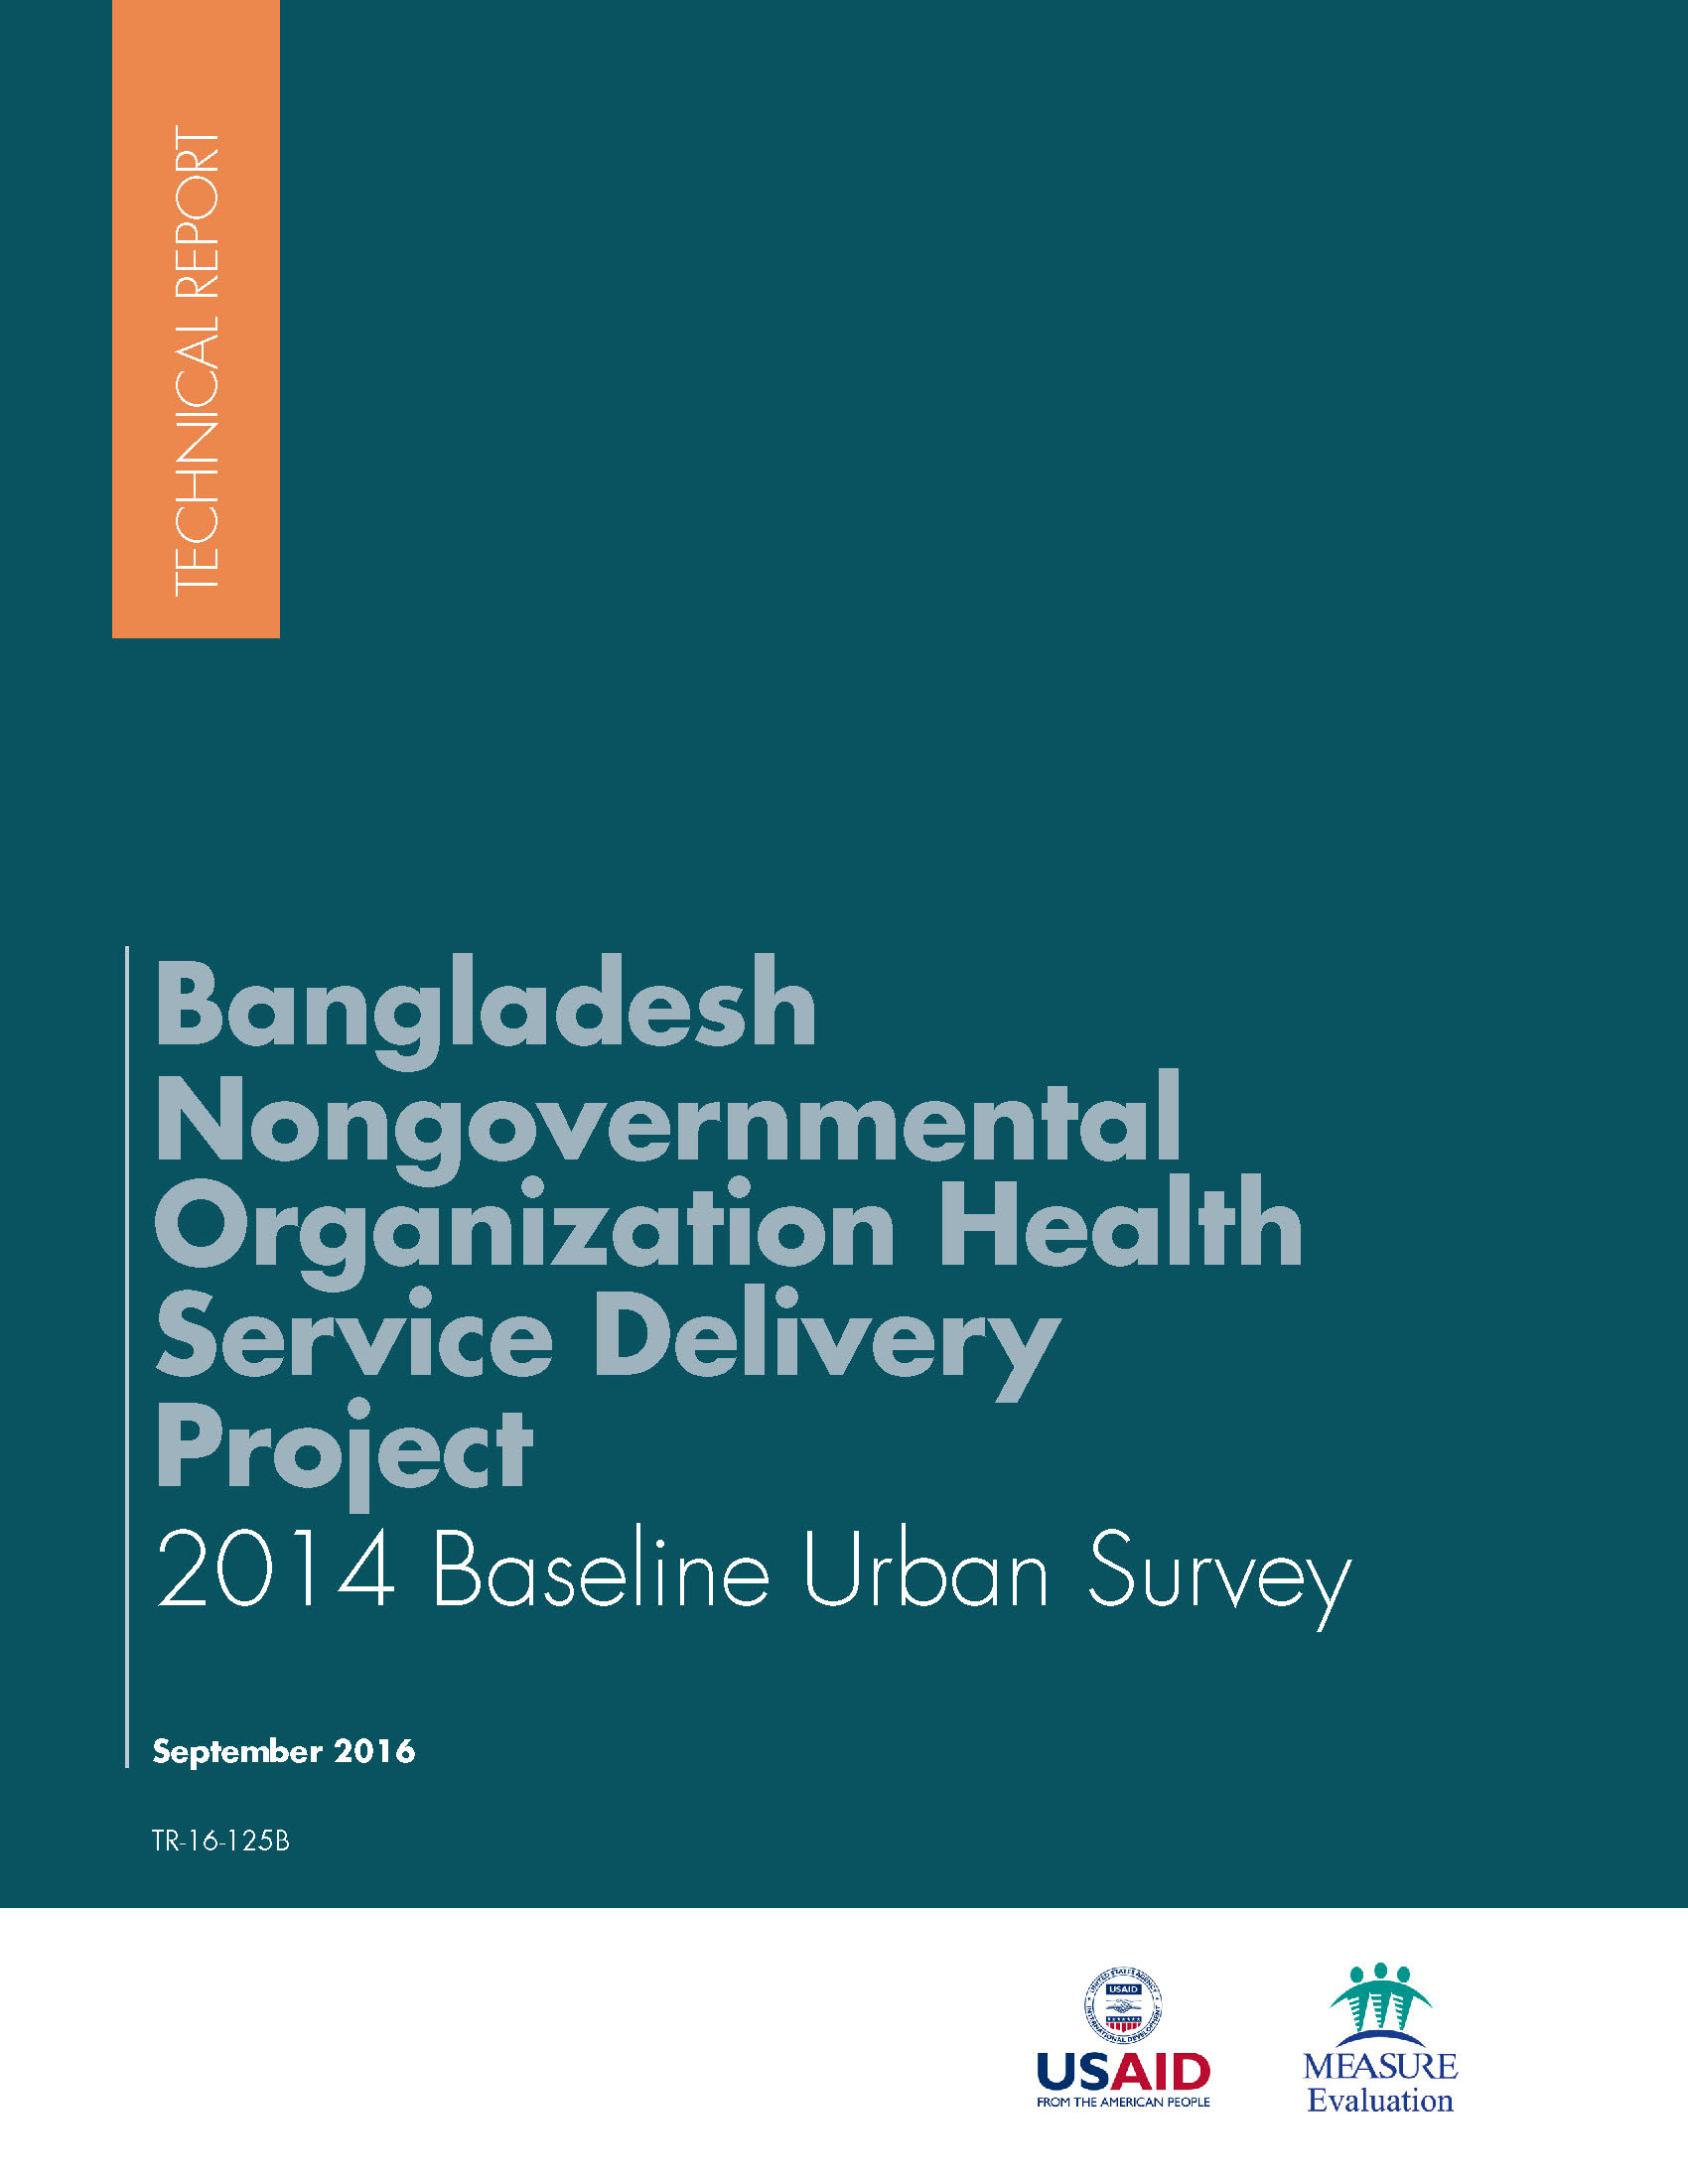 Bangladesh Nongovernmental Organization Health Service Delivery Project 2014 Baseline Urban Survey Report